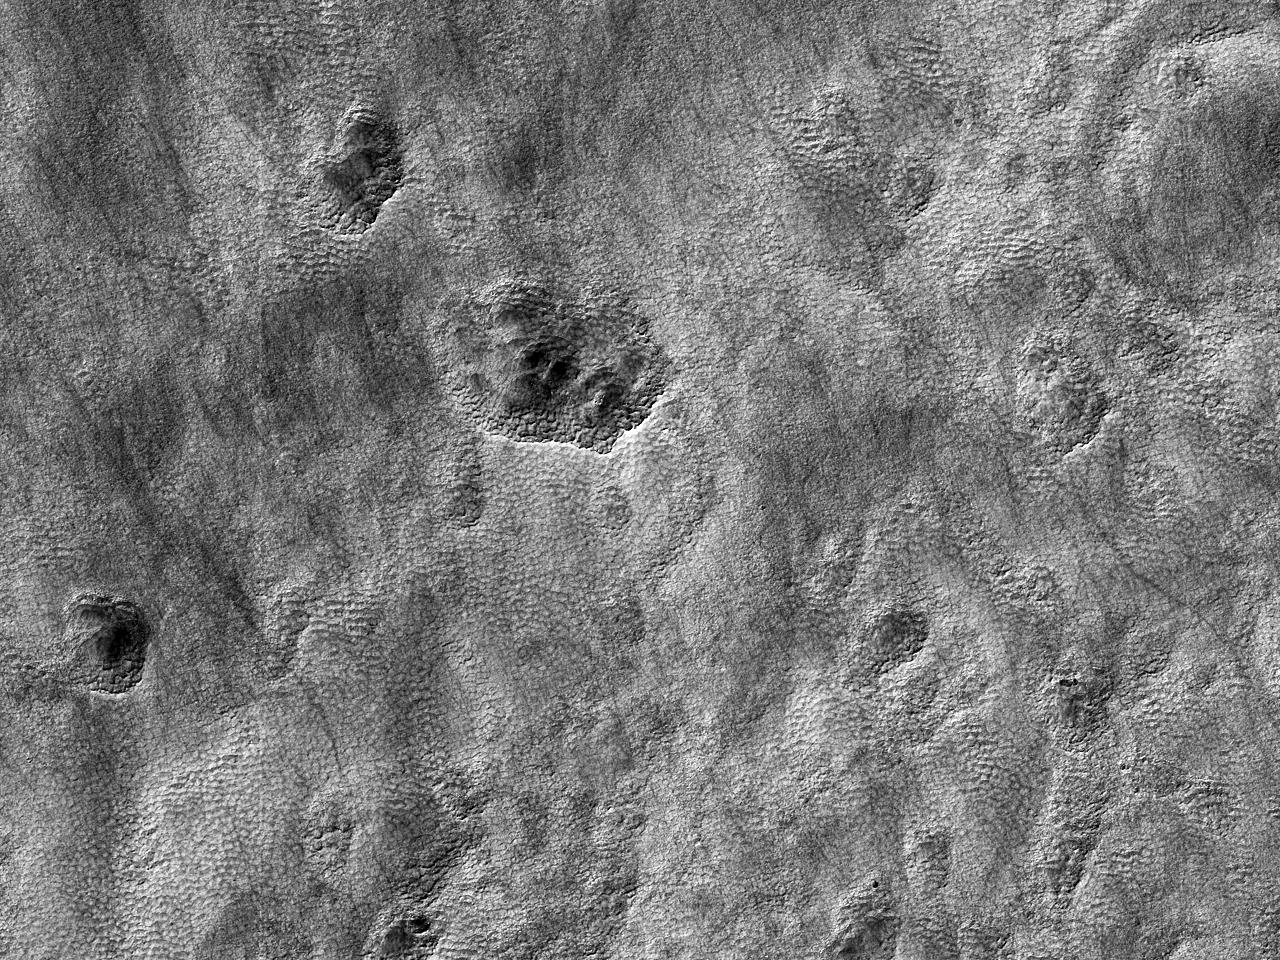 Gruve på den sydlige kanten av Hellas Planitia